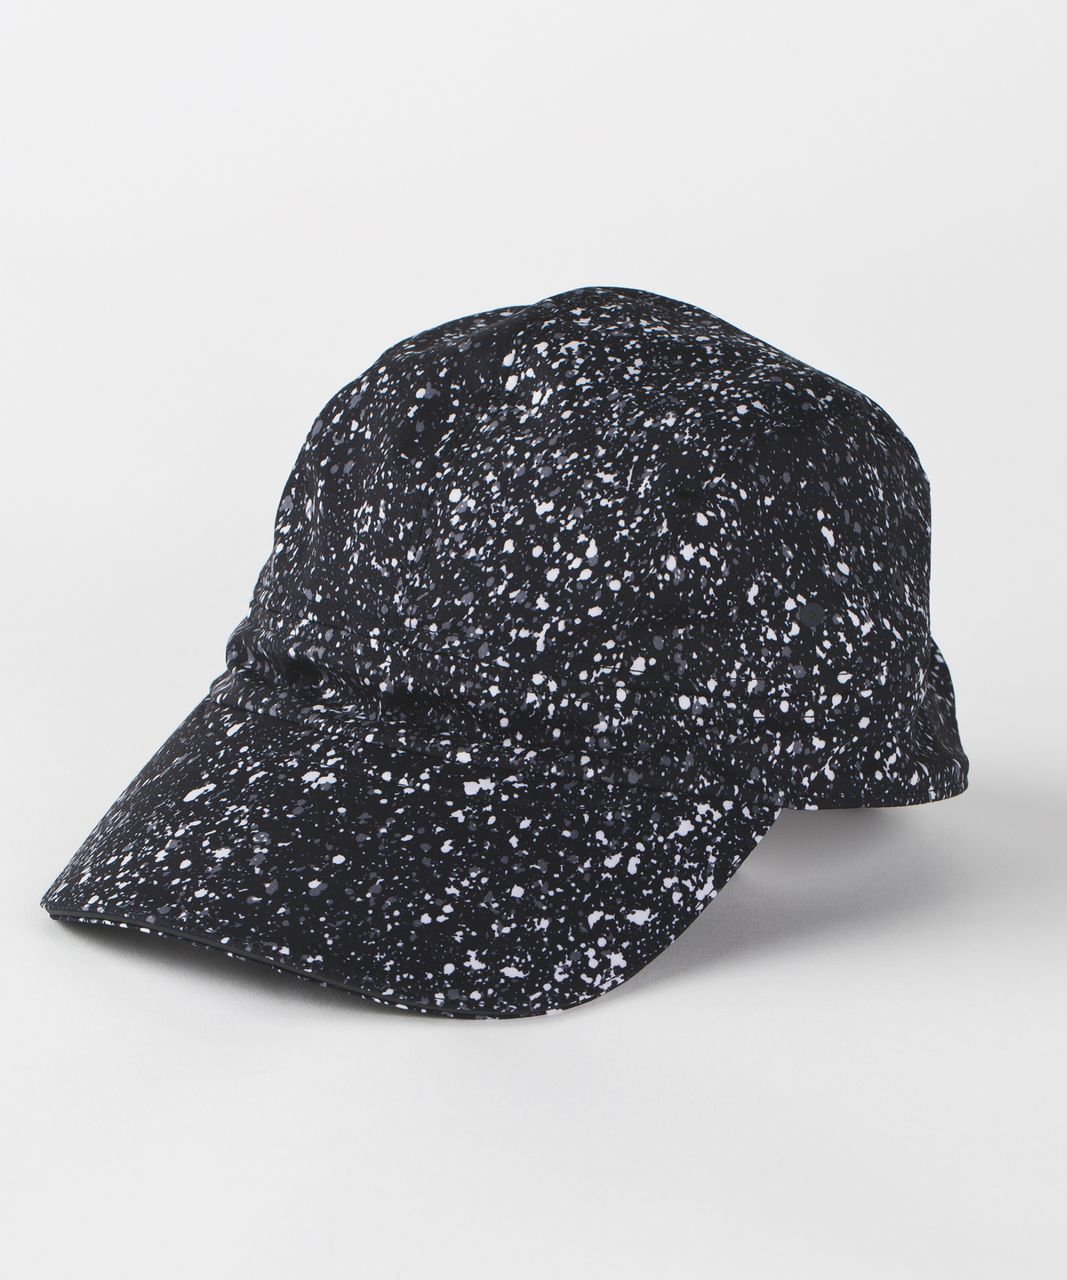 2c098a493a97 Lululemon Race To Place Run Hat 2.0 - Splatter White Black in 2019 ...